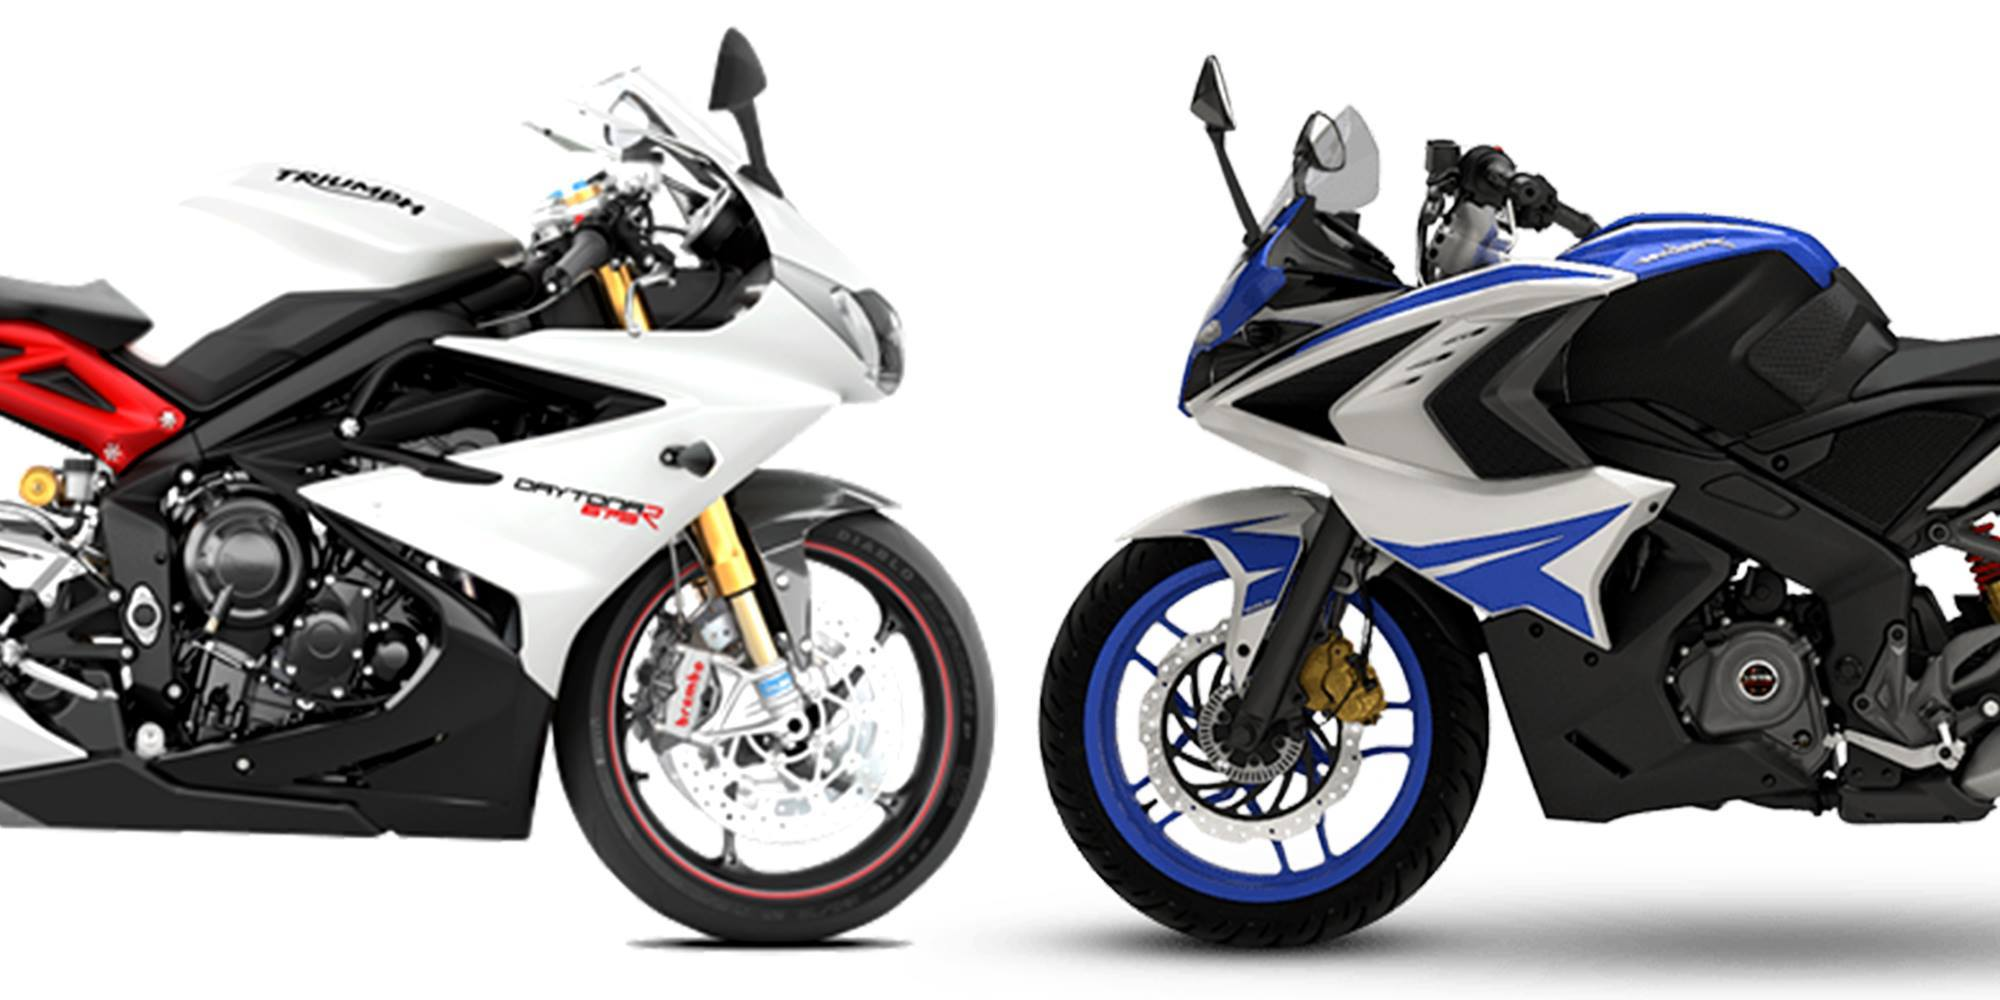 Bajaj Auto Triumph Motorcycles Uk Announces Global Partnership To